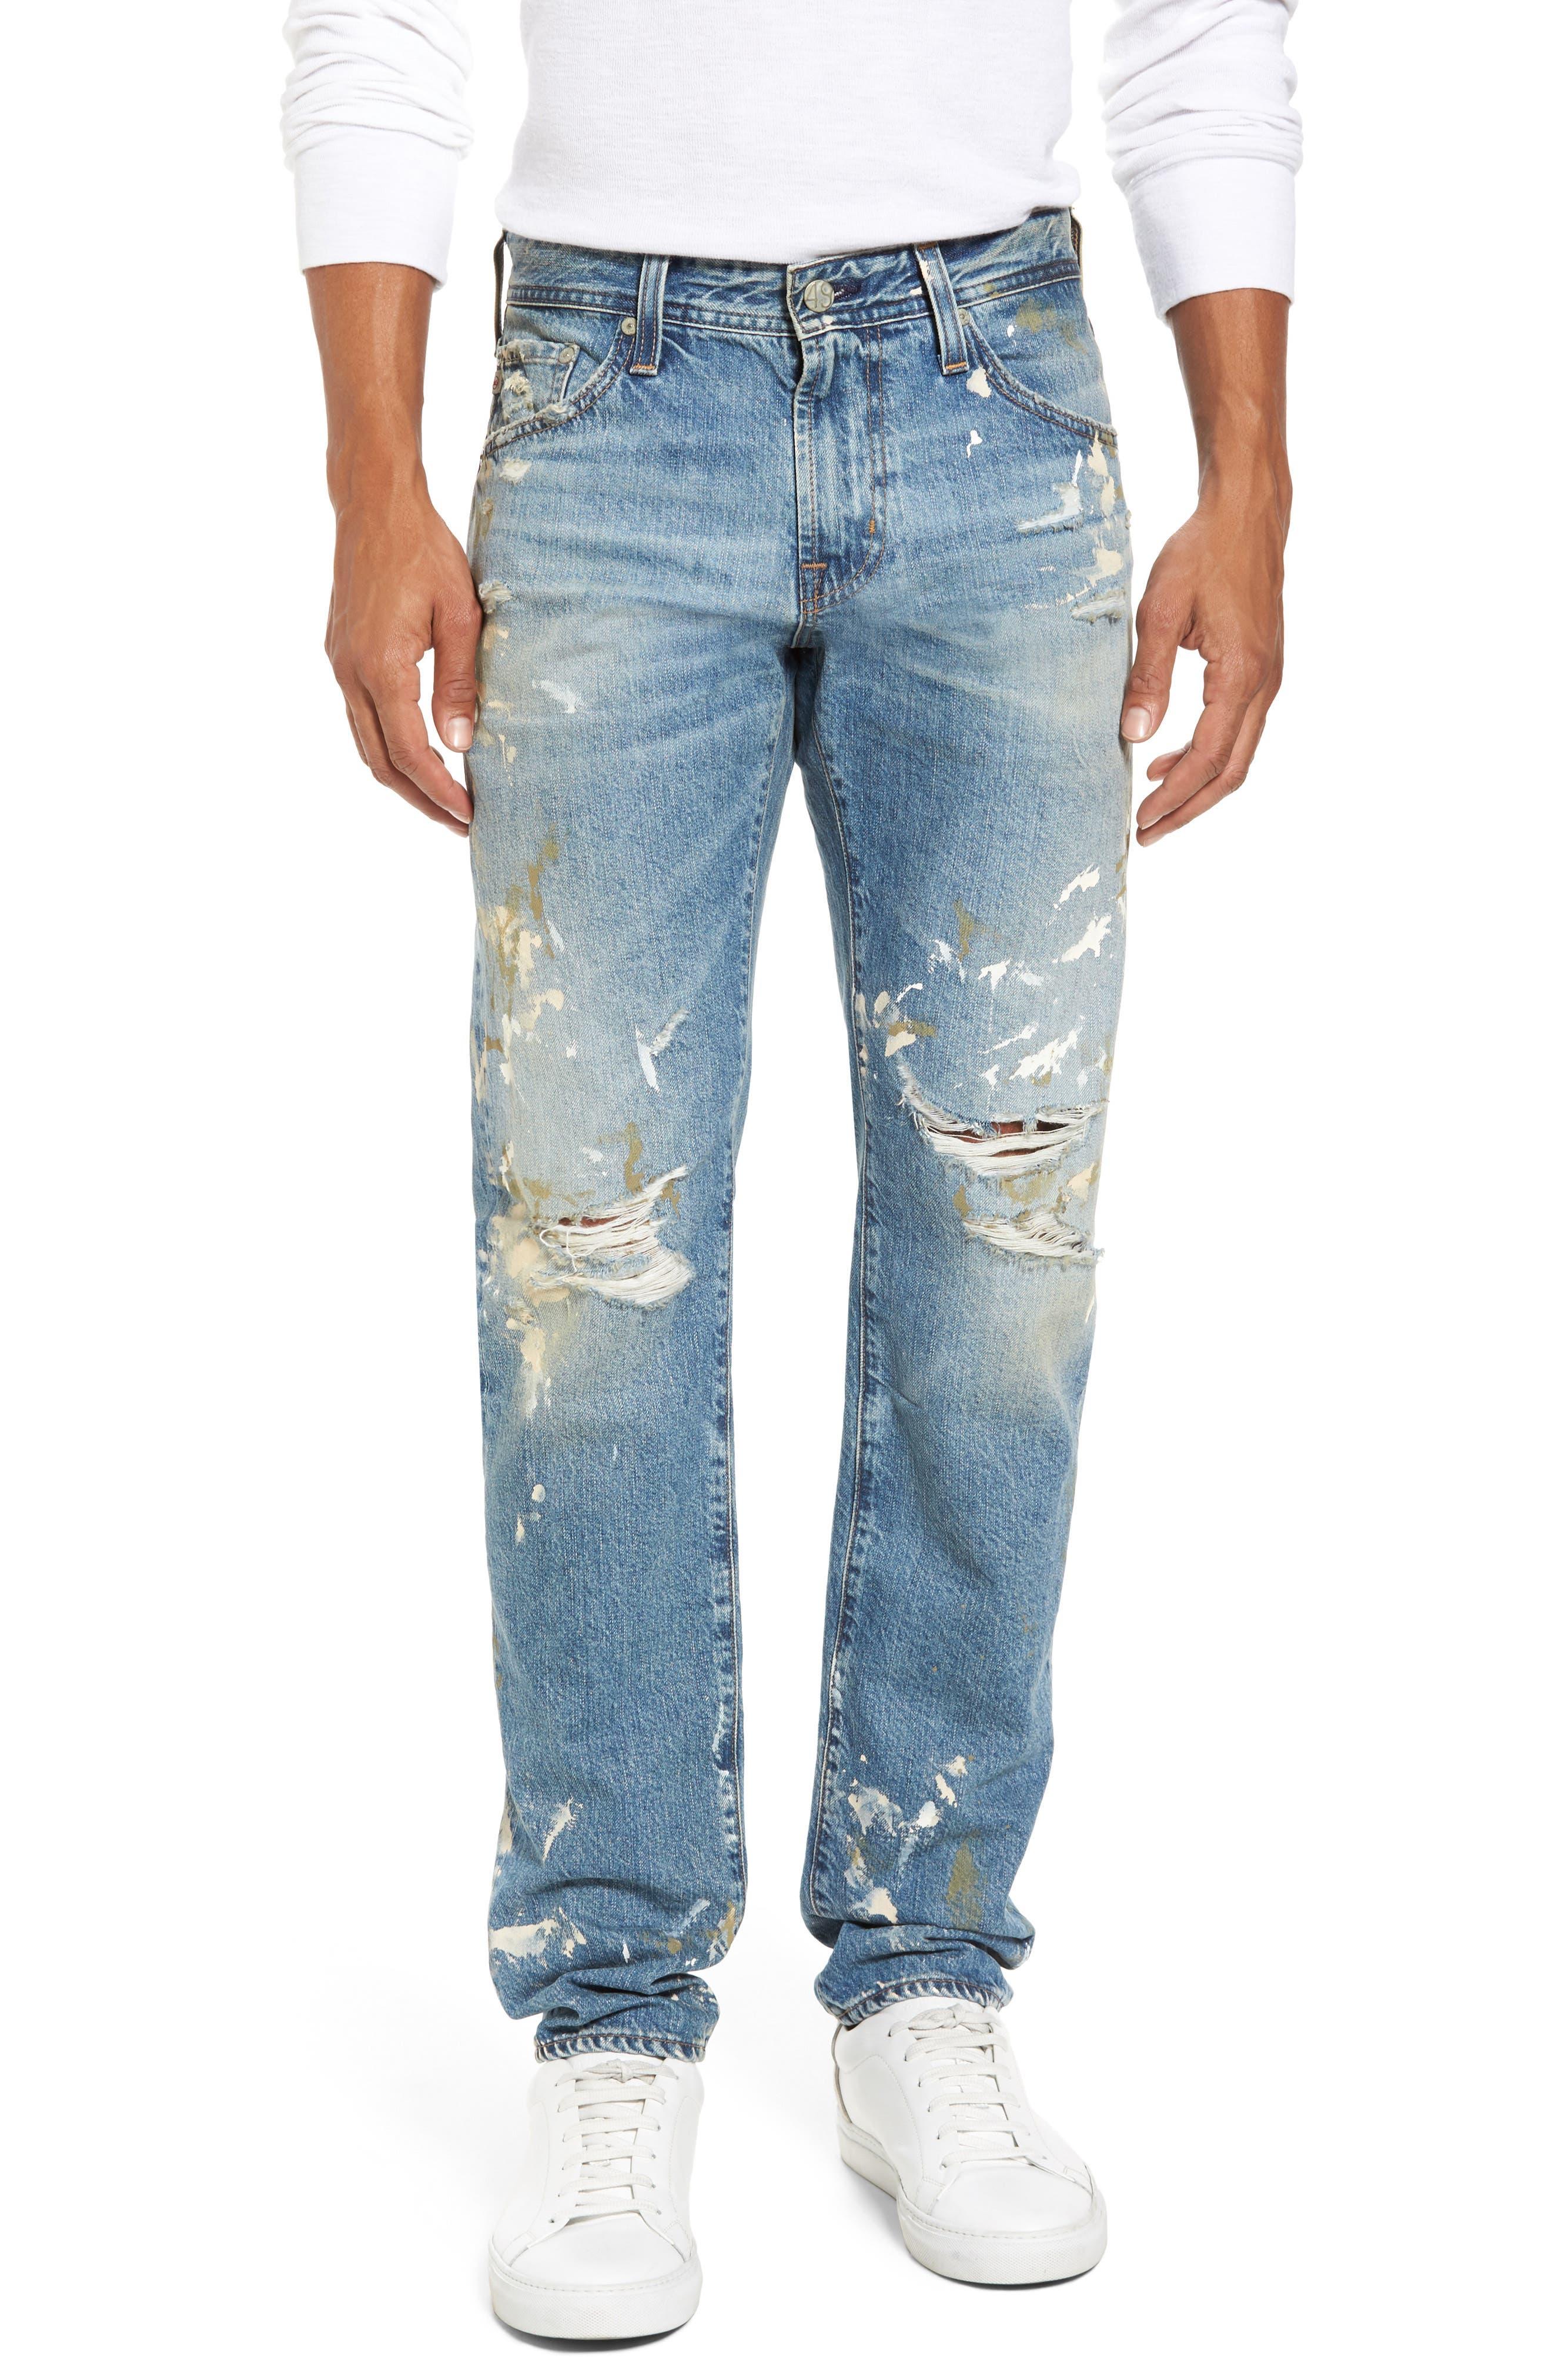 Tellis Modern Slim Fit Jeans,                             Main thumbnail 1, color,                             18 Years Carpenter